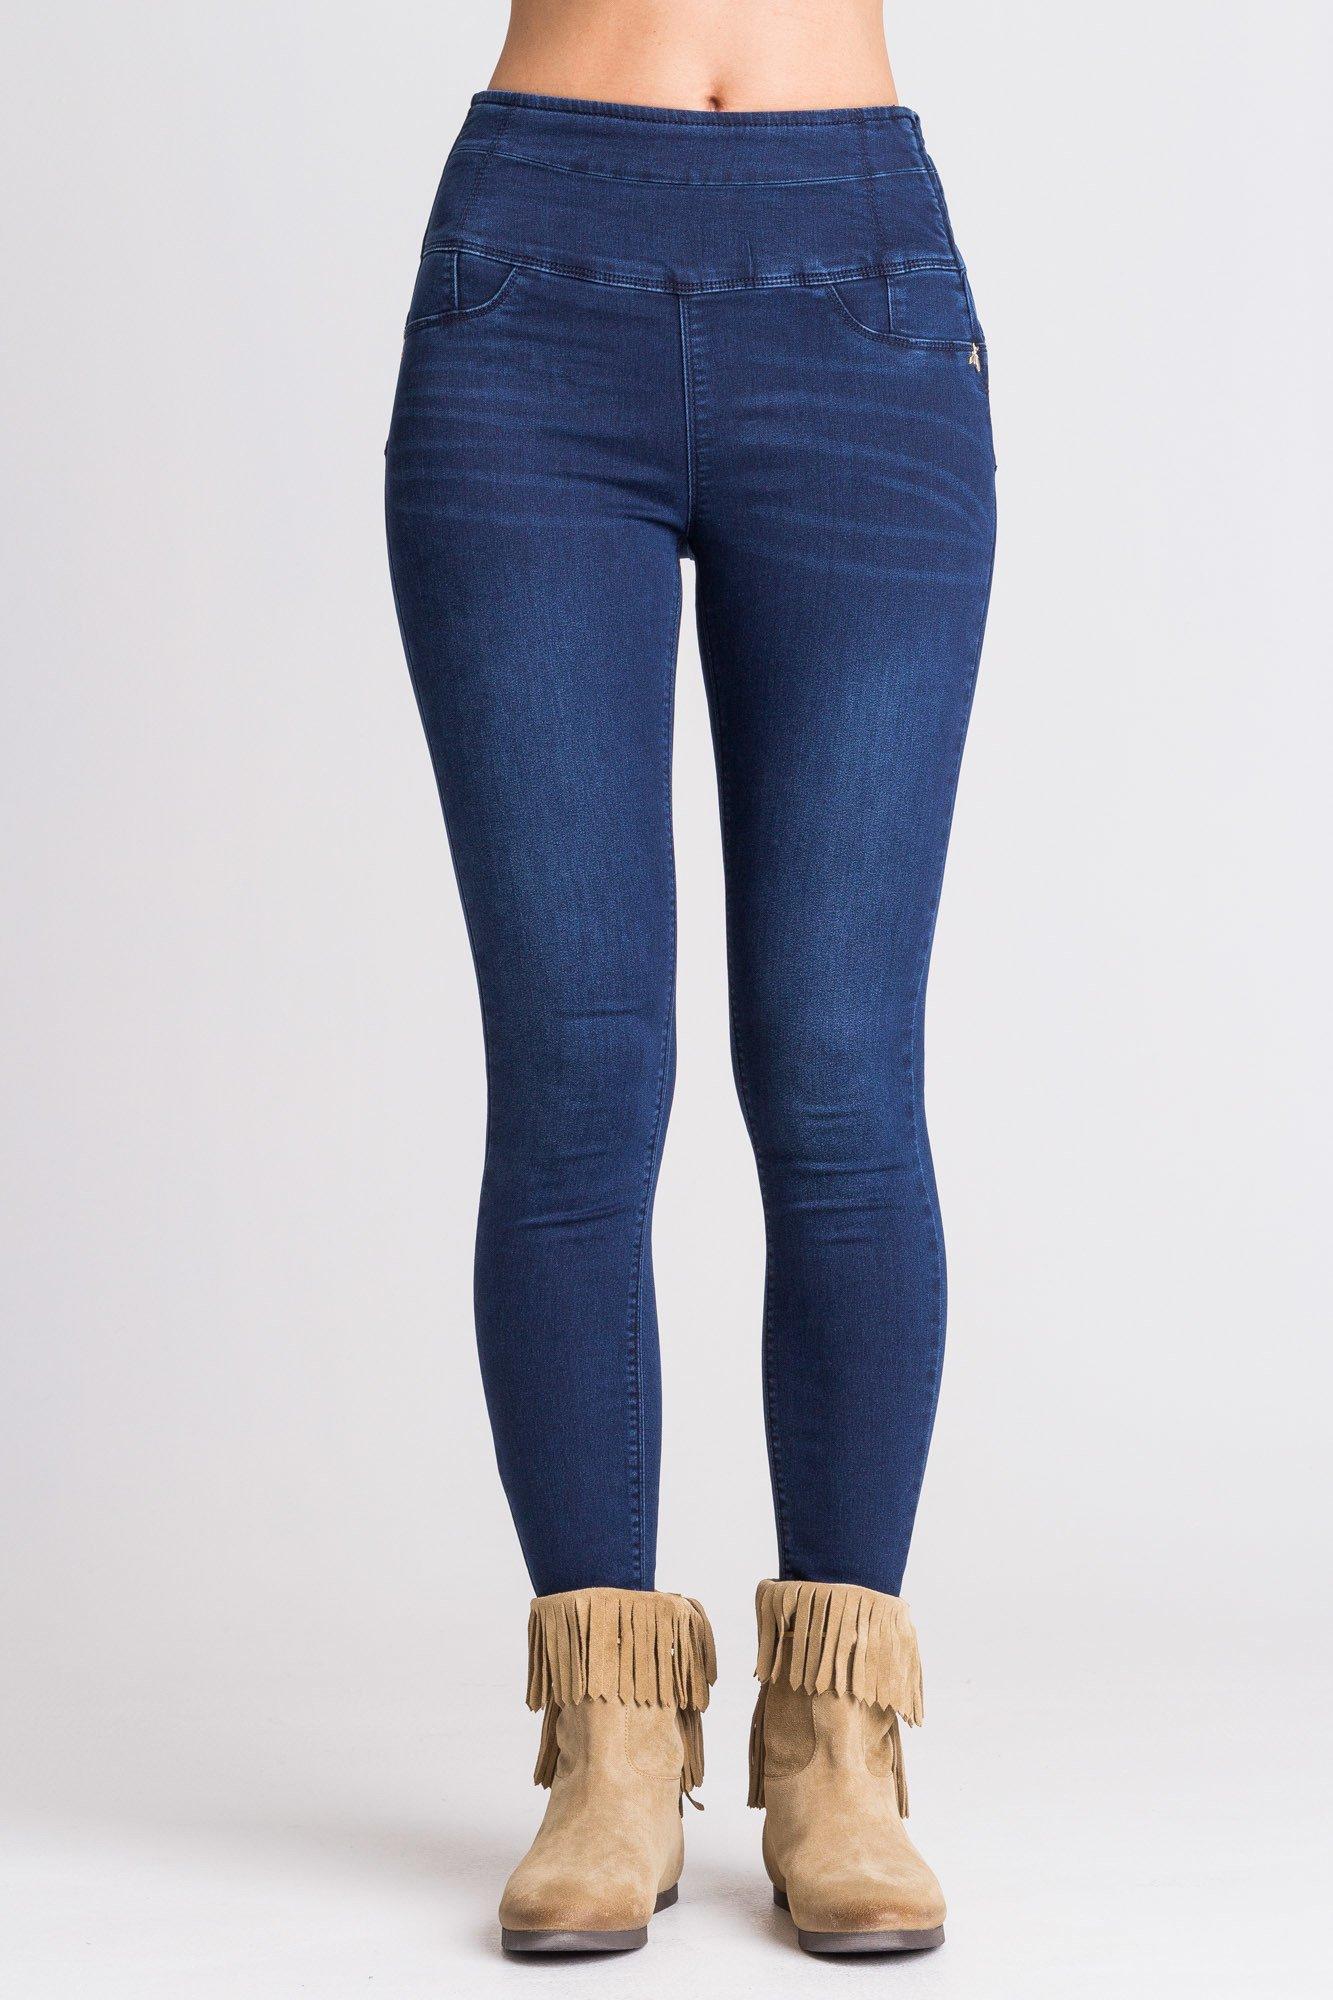 5d7e6496a3d14b Granatowe jeansy z wysokim stanem; Granatowe jeansy z wysokim stanem ...